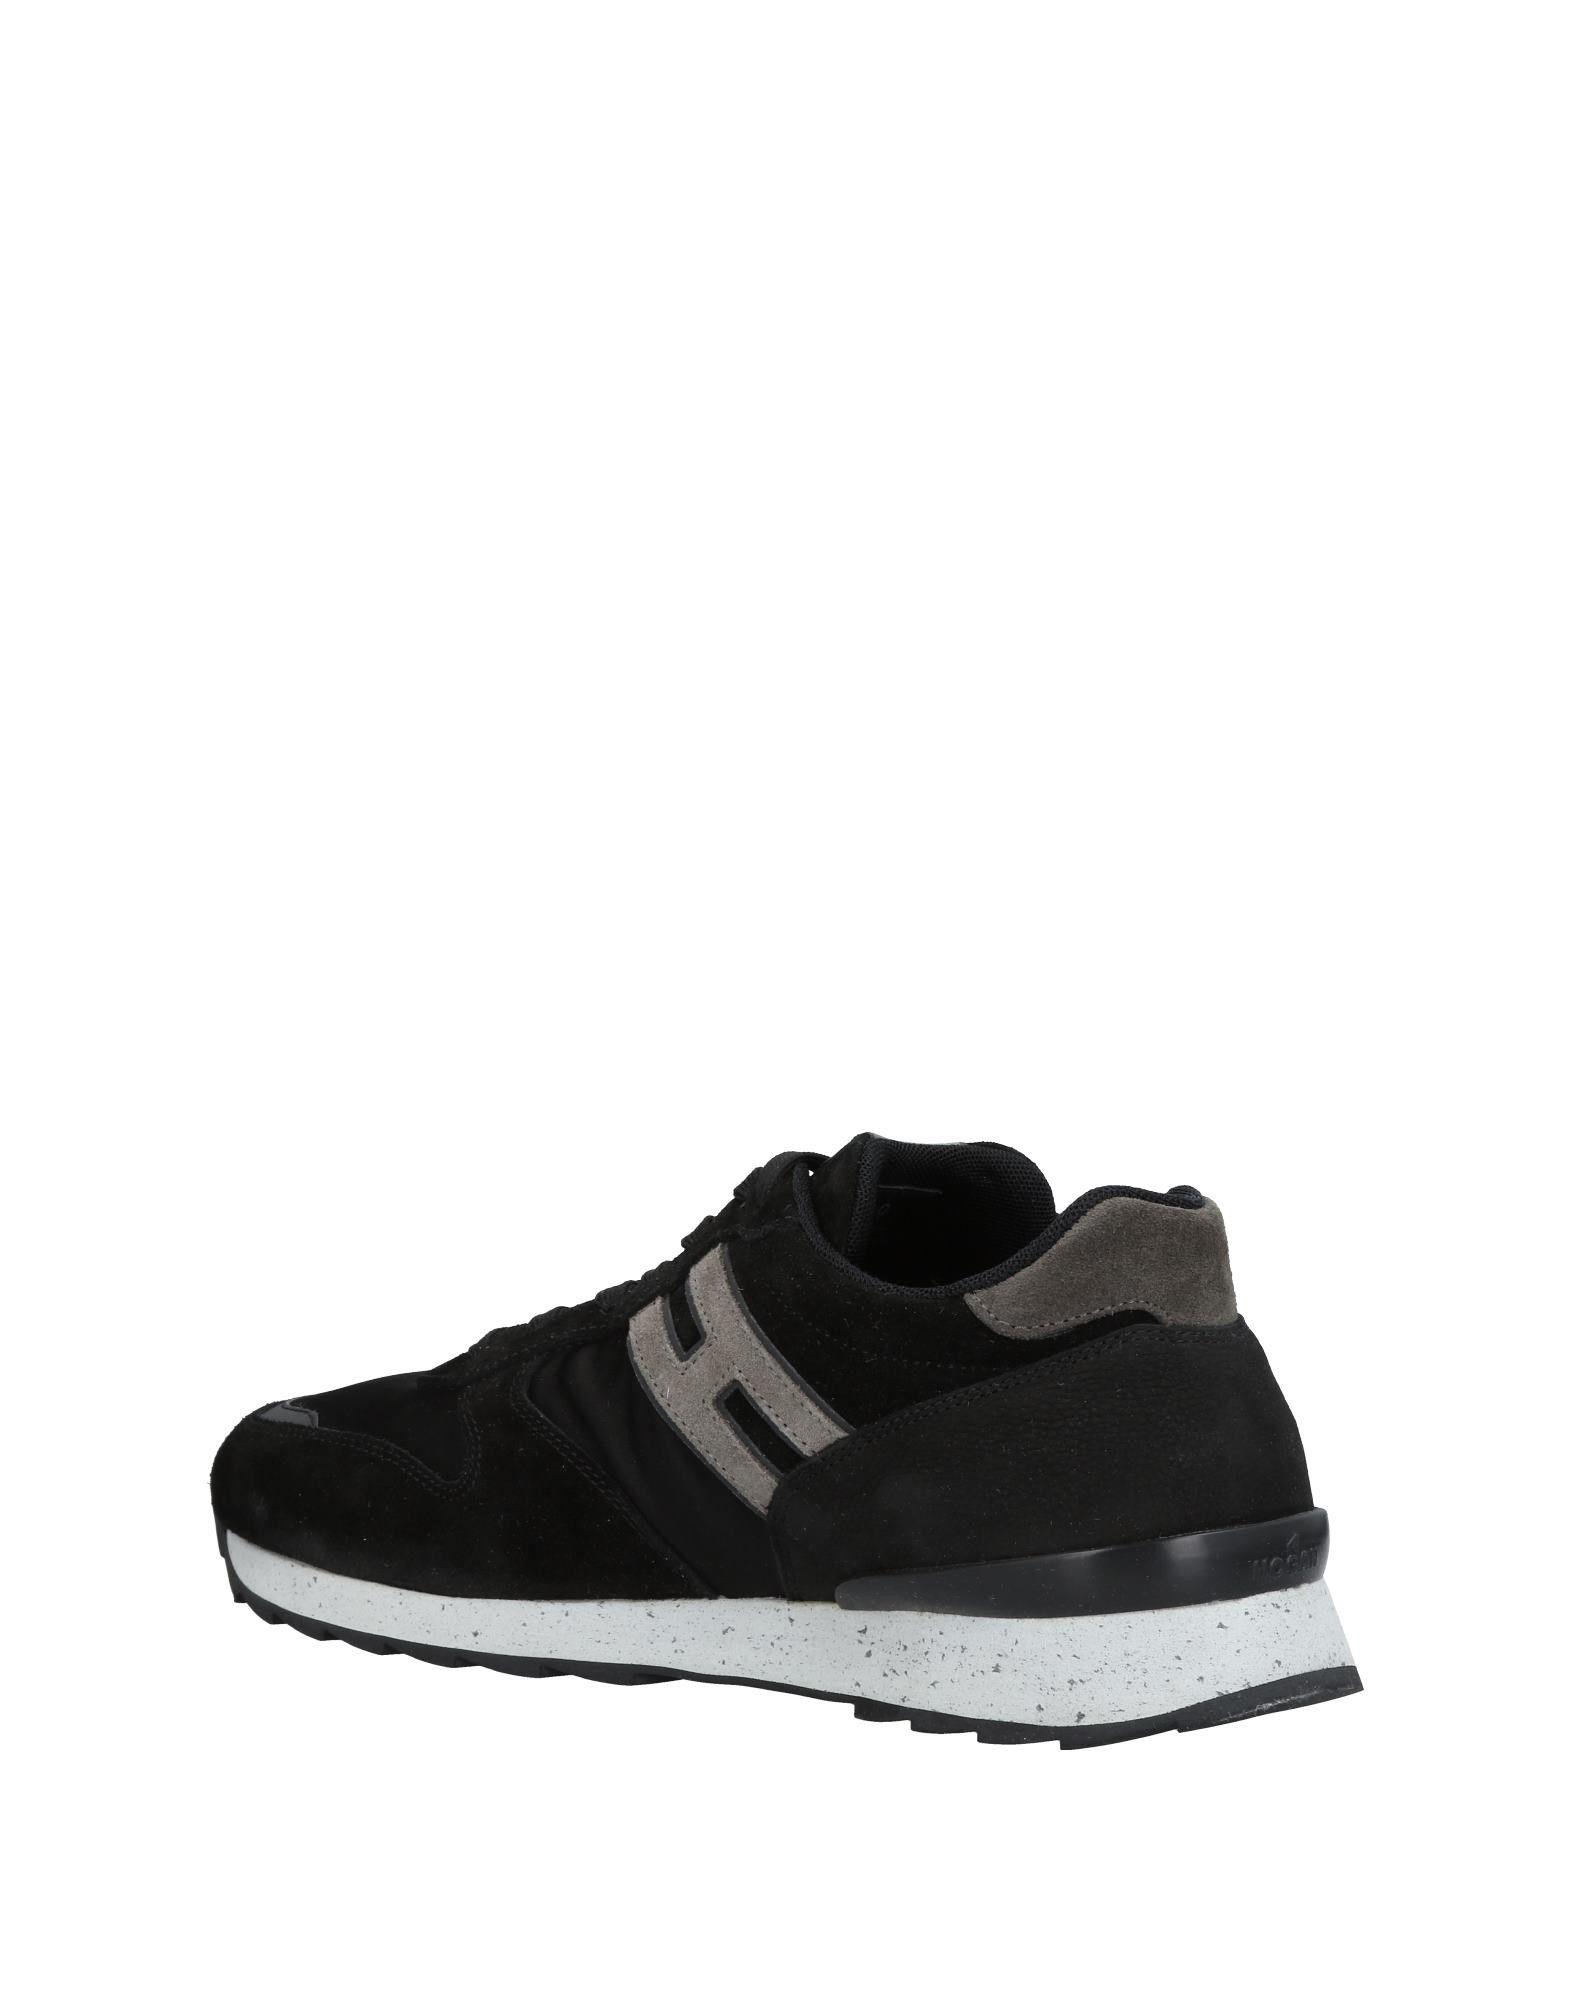 Hogan Sneakers Herren  11461862WS Gute Qualität beliebte Schuhe